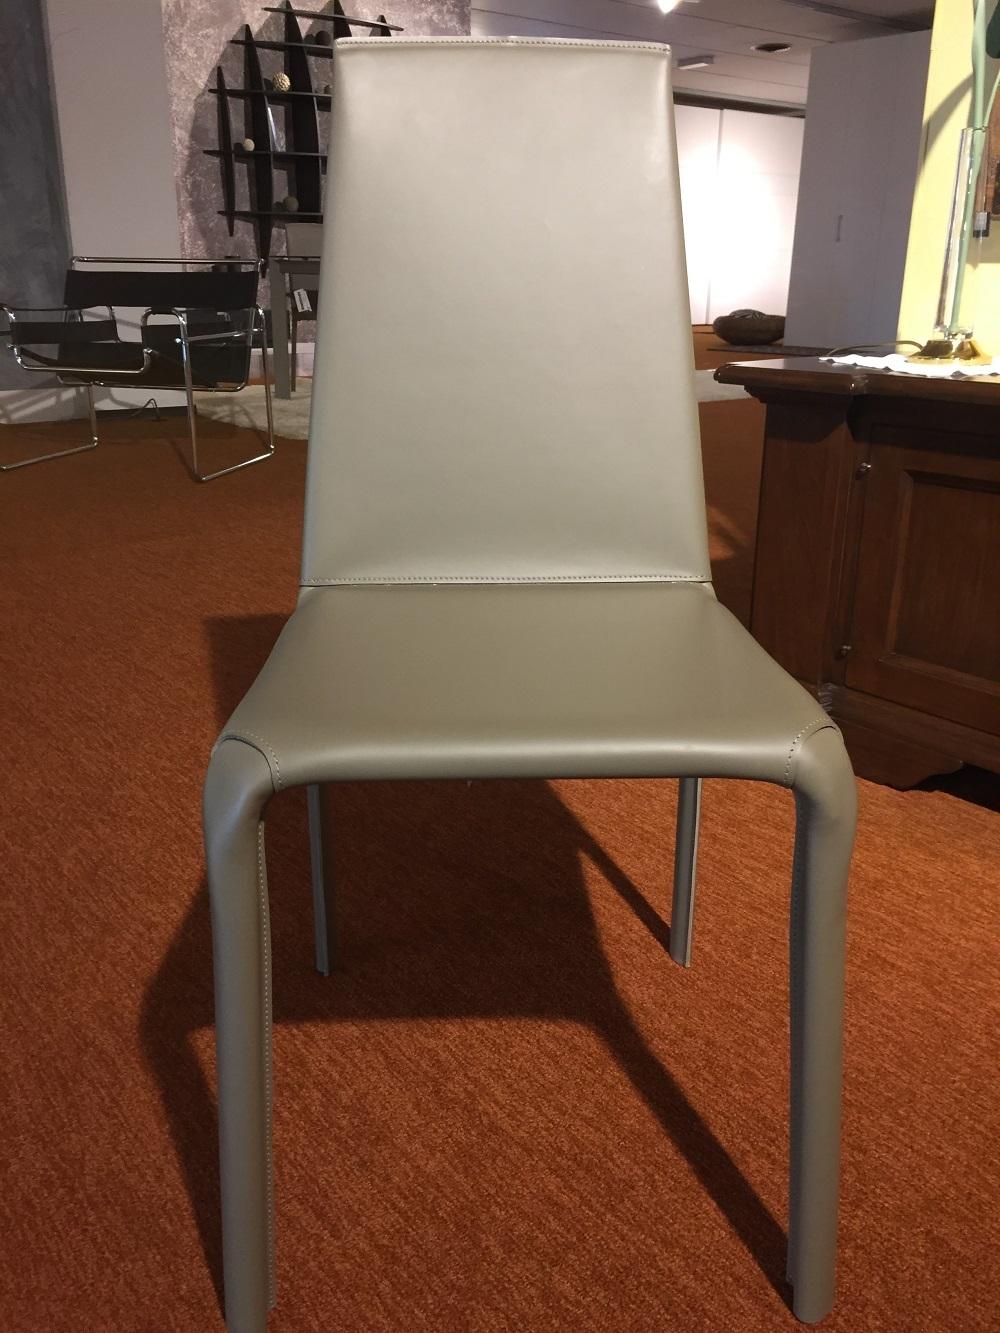 Tavolo bontempi casa mod niko allungabile con sedie alice for Tavolo allungabile con sedie a scomparsa